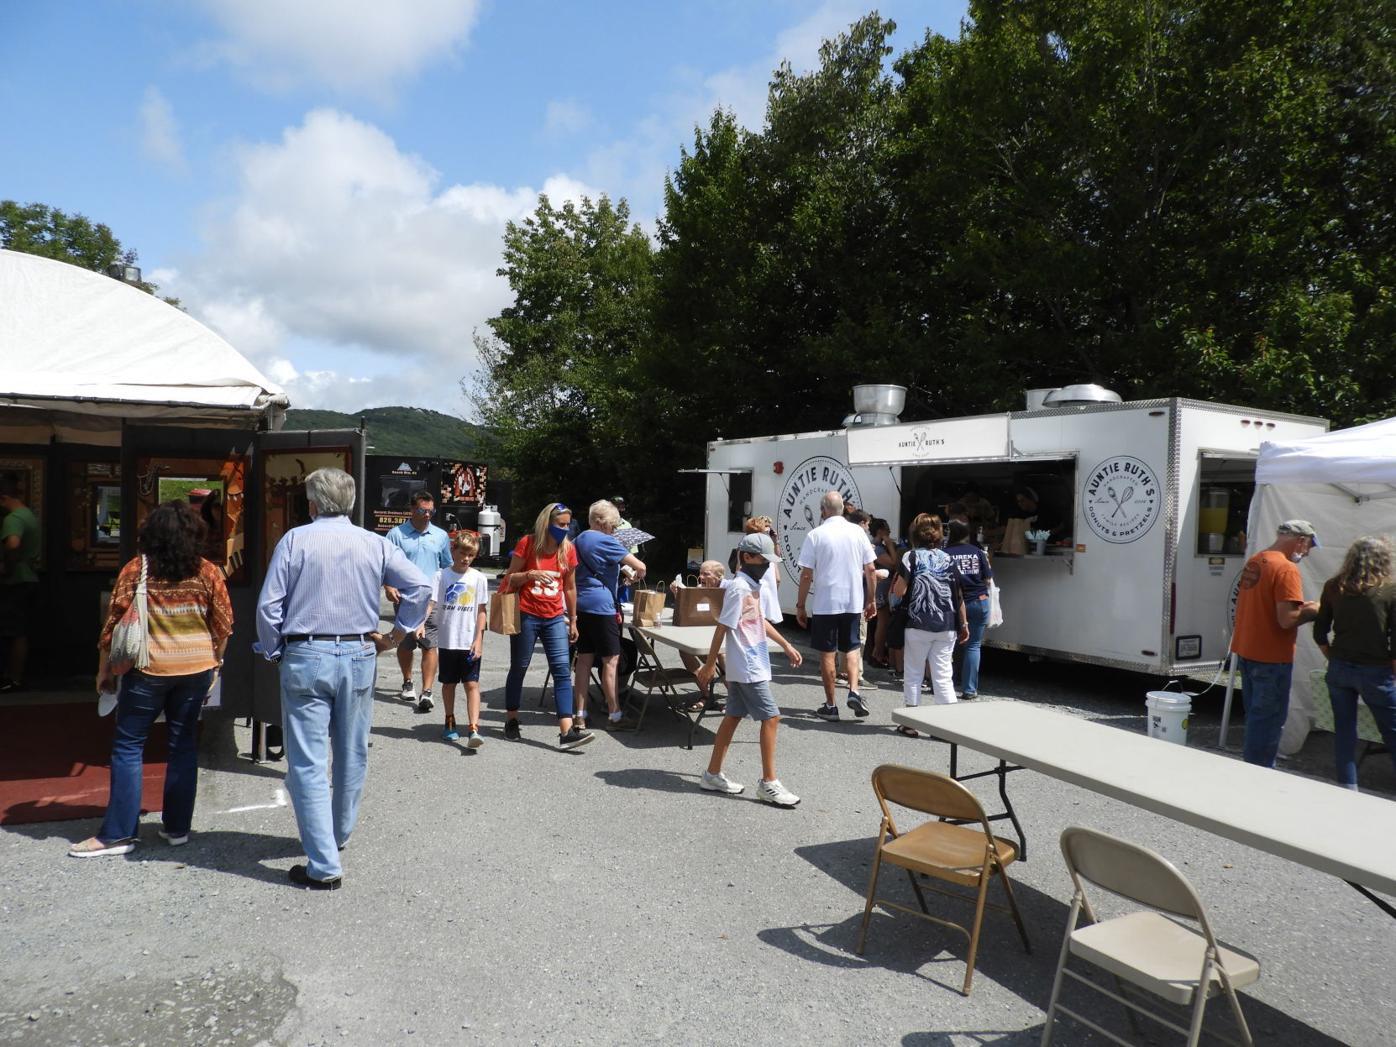 Crowd visits art festival